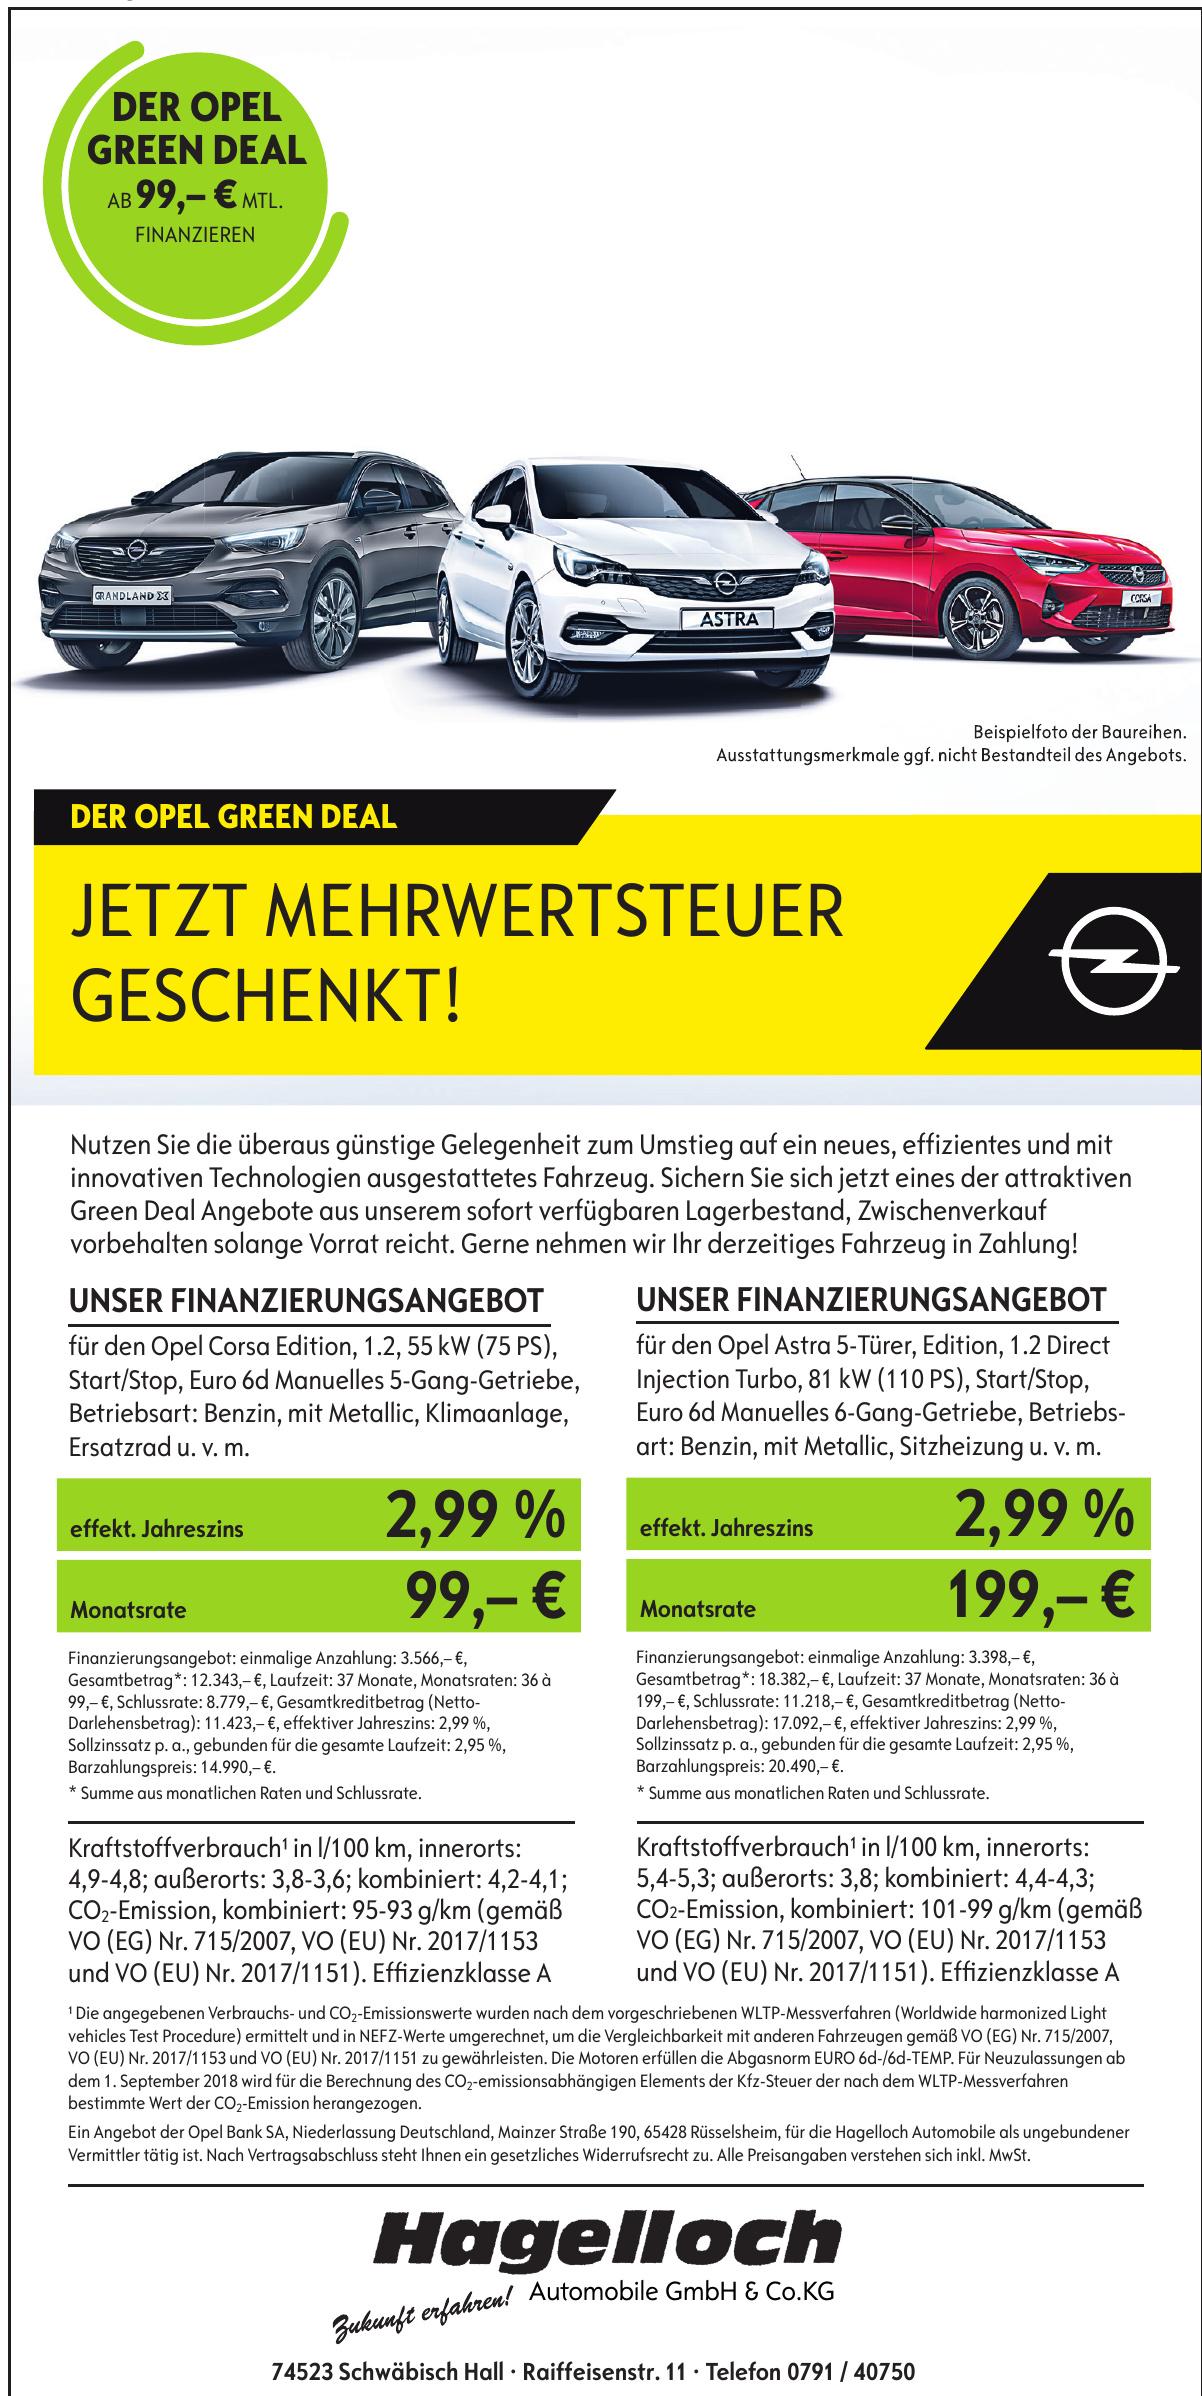 Hagelloch Automobile GmbH & Co. KG